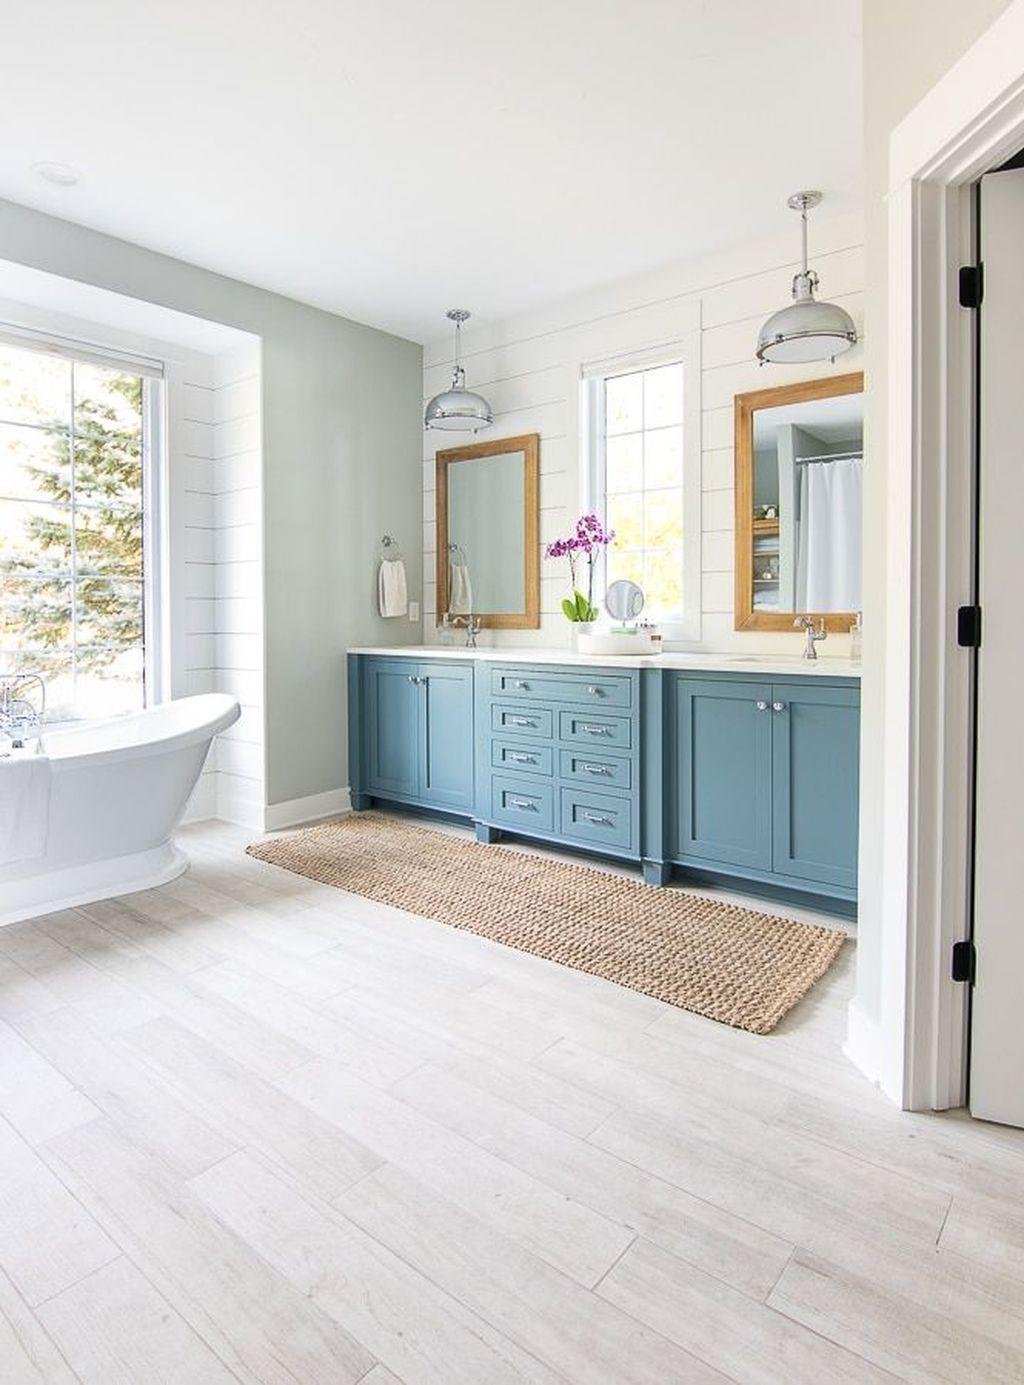 36 Fabulous Coastal Style Bathroom Decor Ideas in 2020 ...